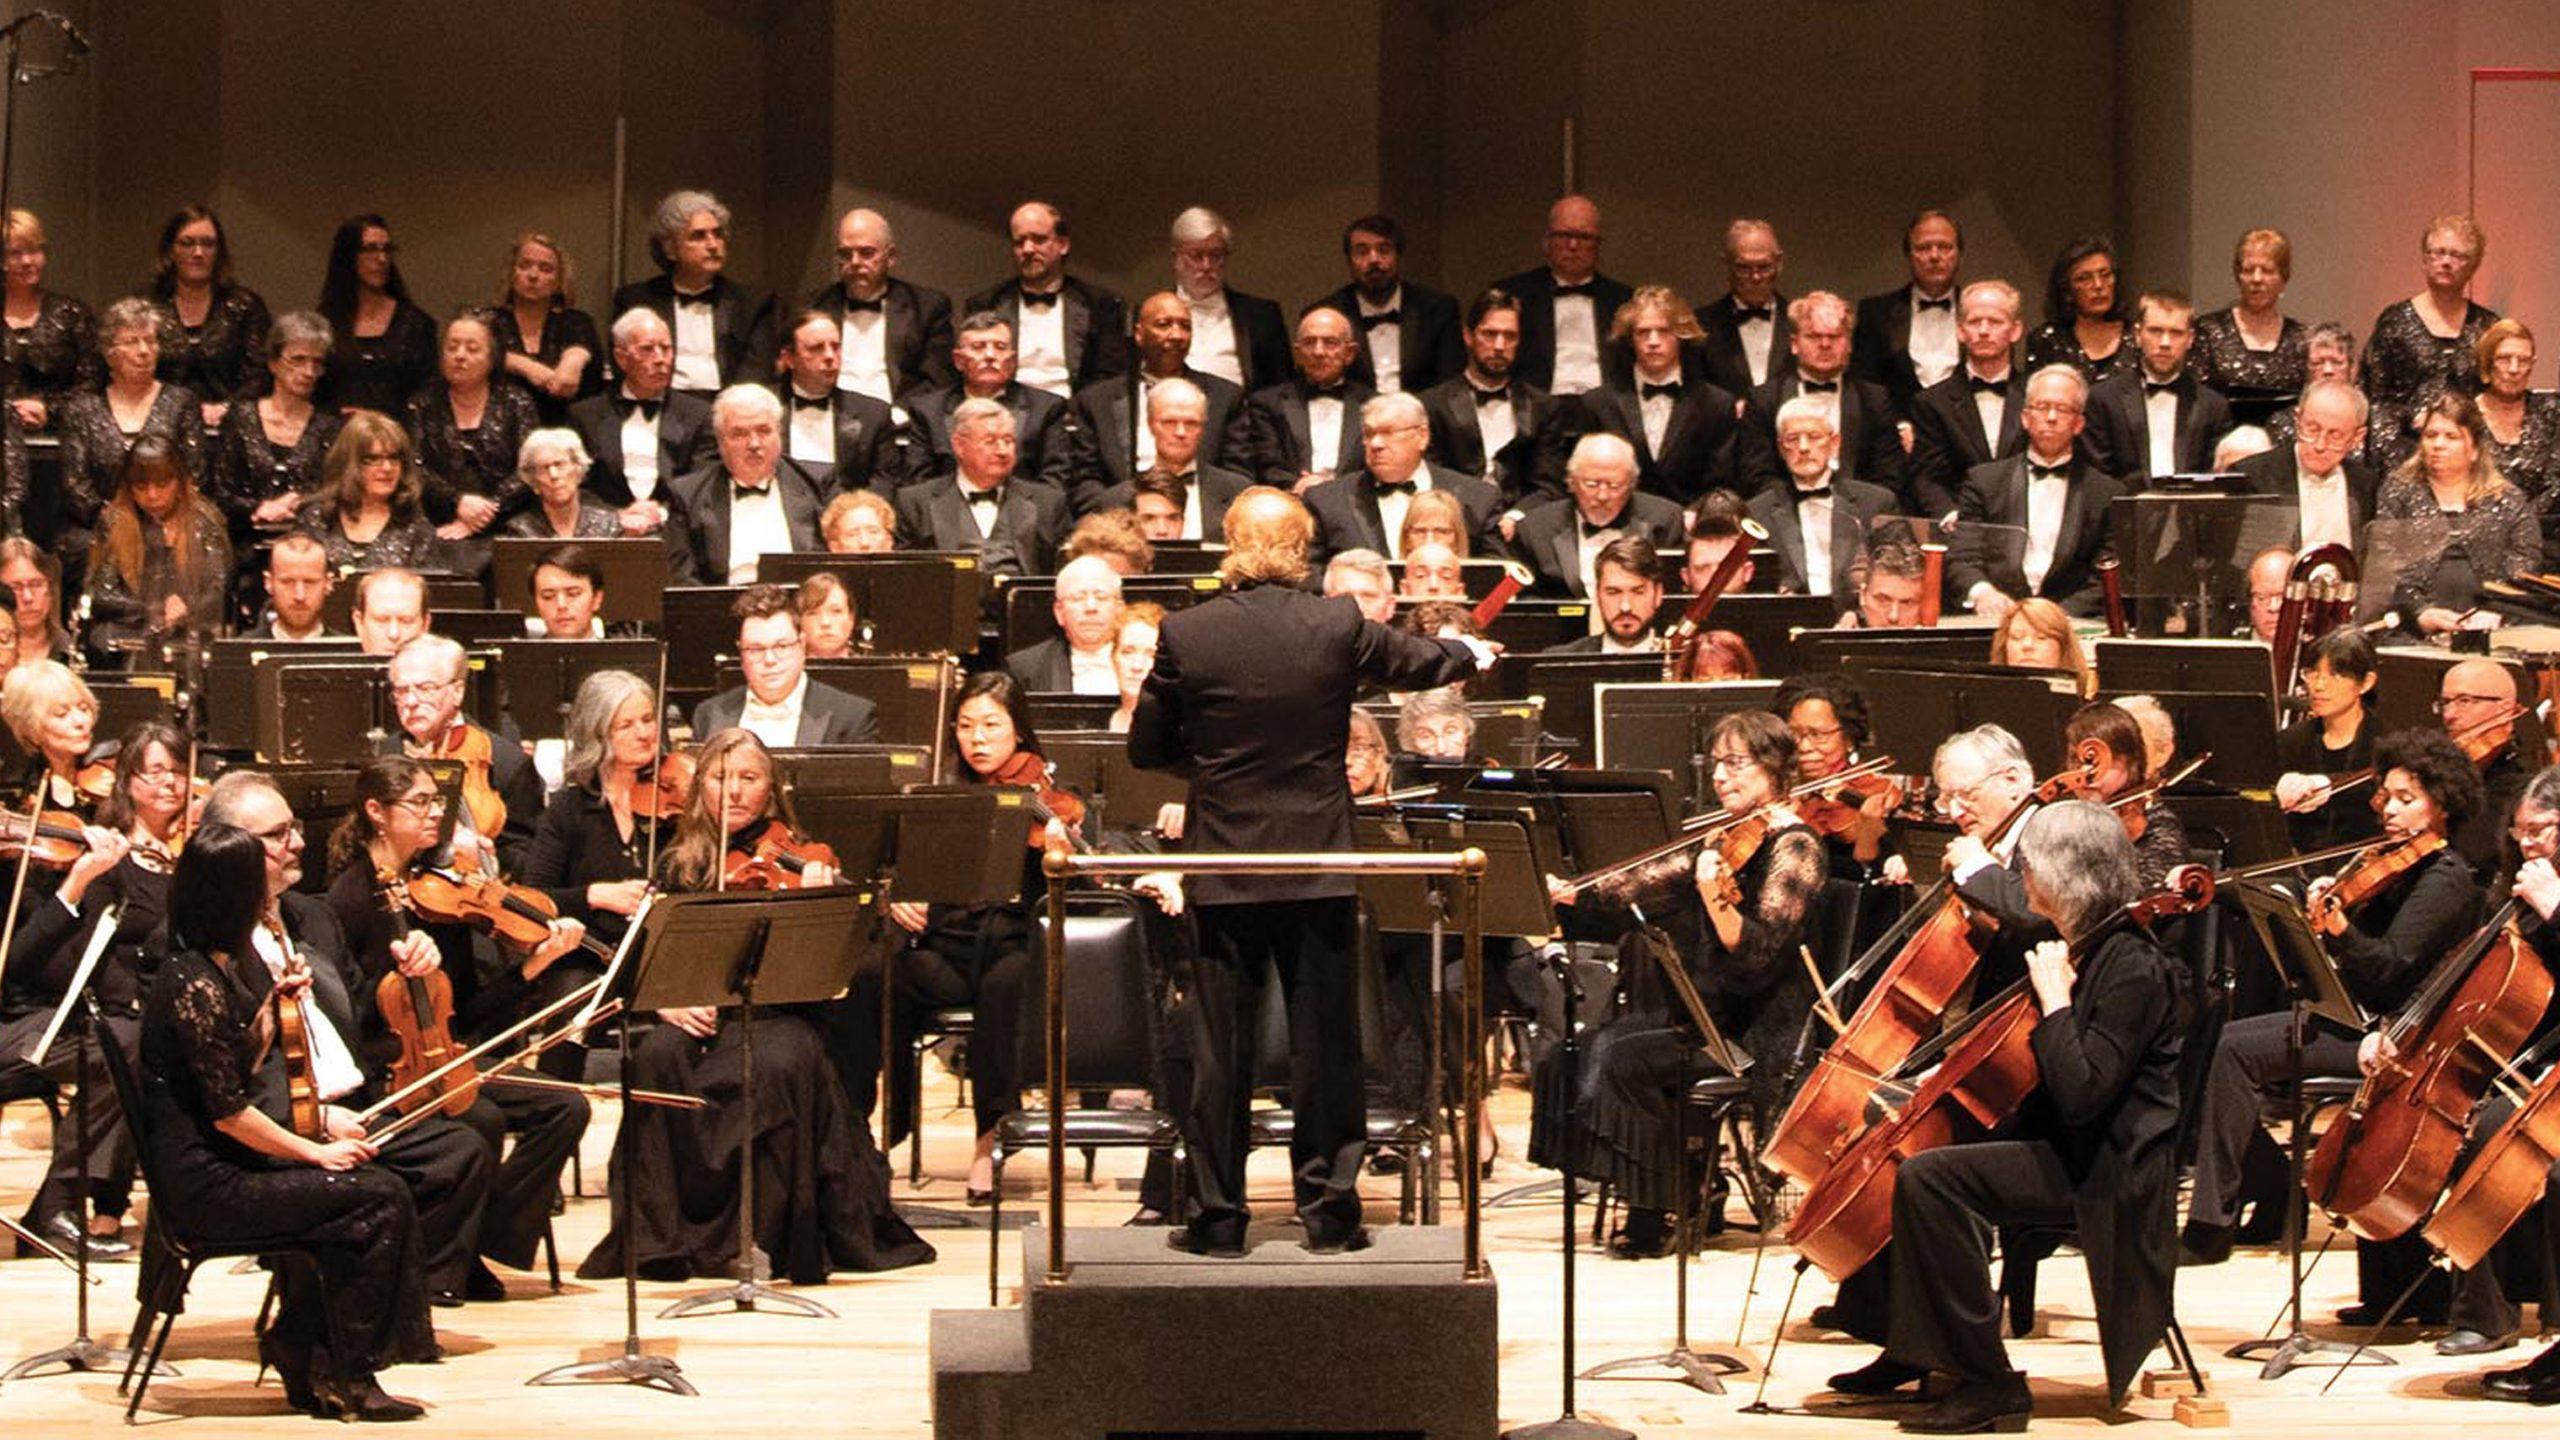 The Flint Symphony Orchestra